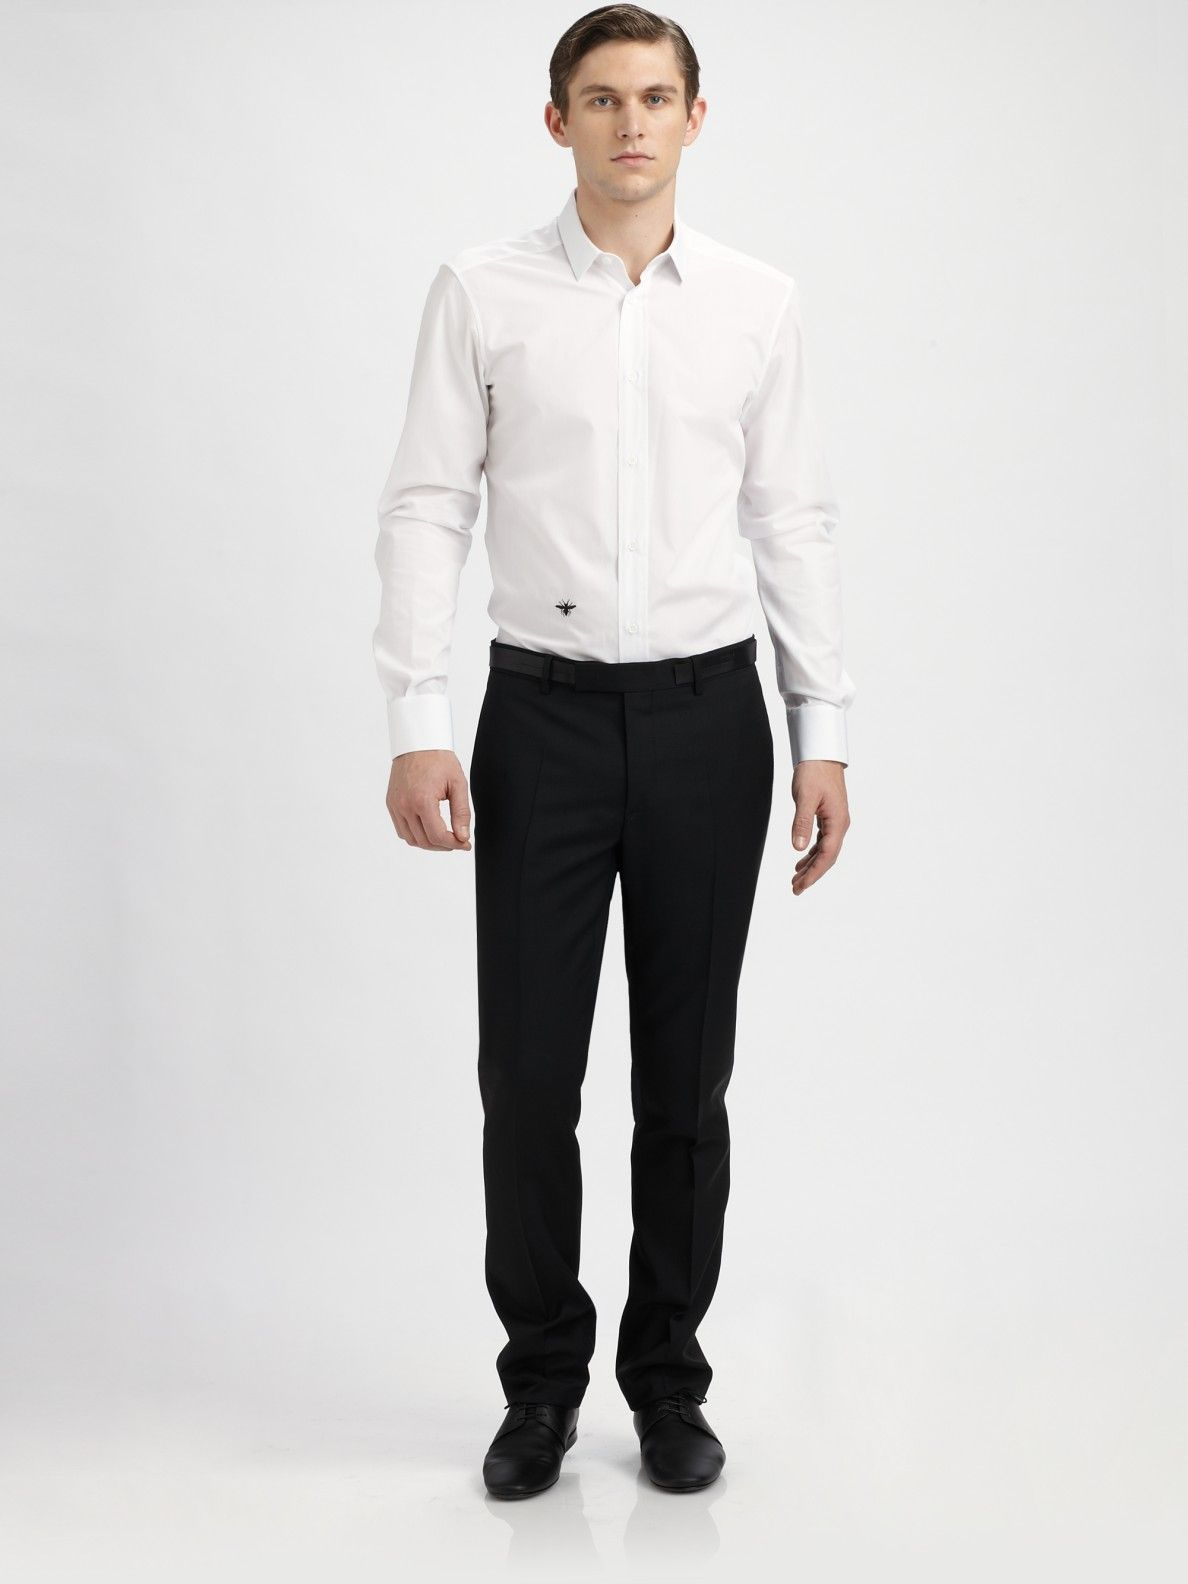 3008fc44f4f88 Dior homme Poplin Dress Shirt in White for Men | shirt | Poplin ...